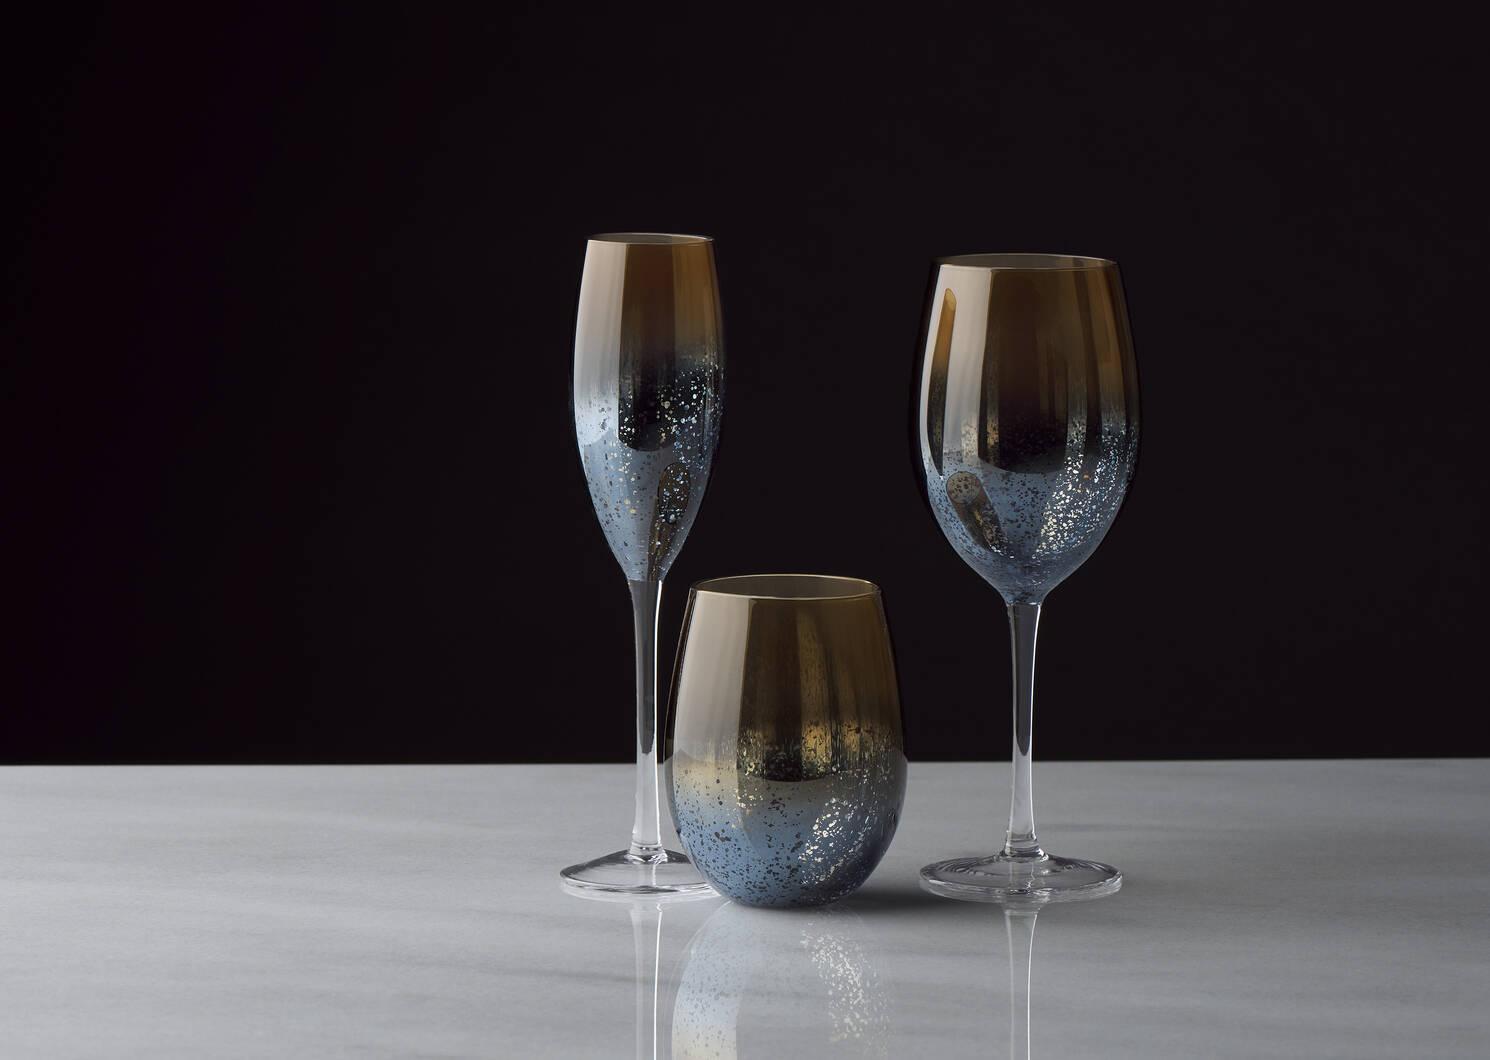 Rhapsody Champagne Flute Sunset/Blue